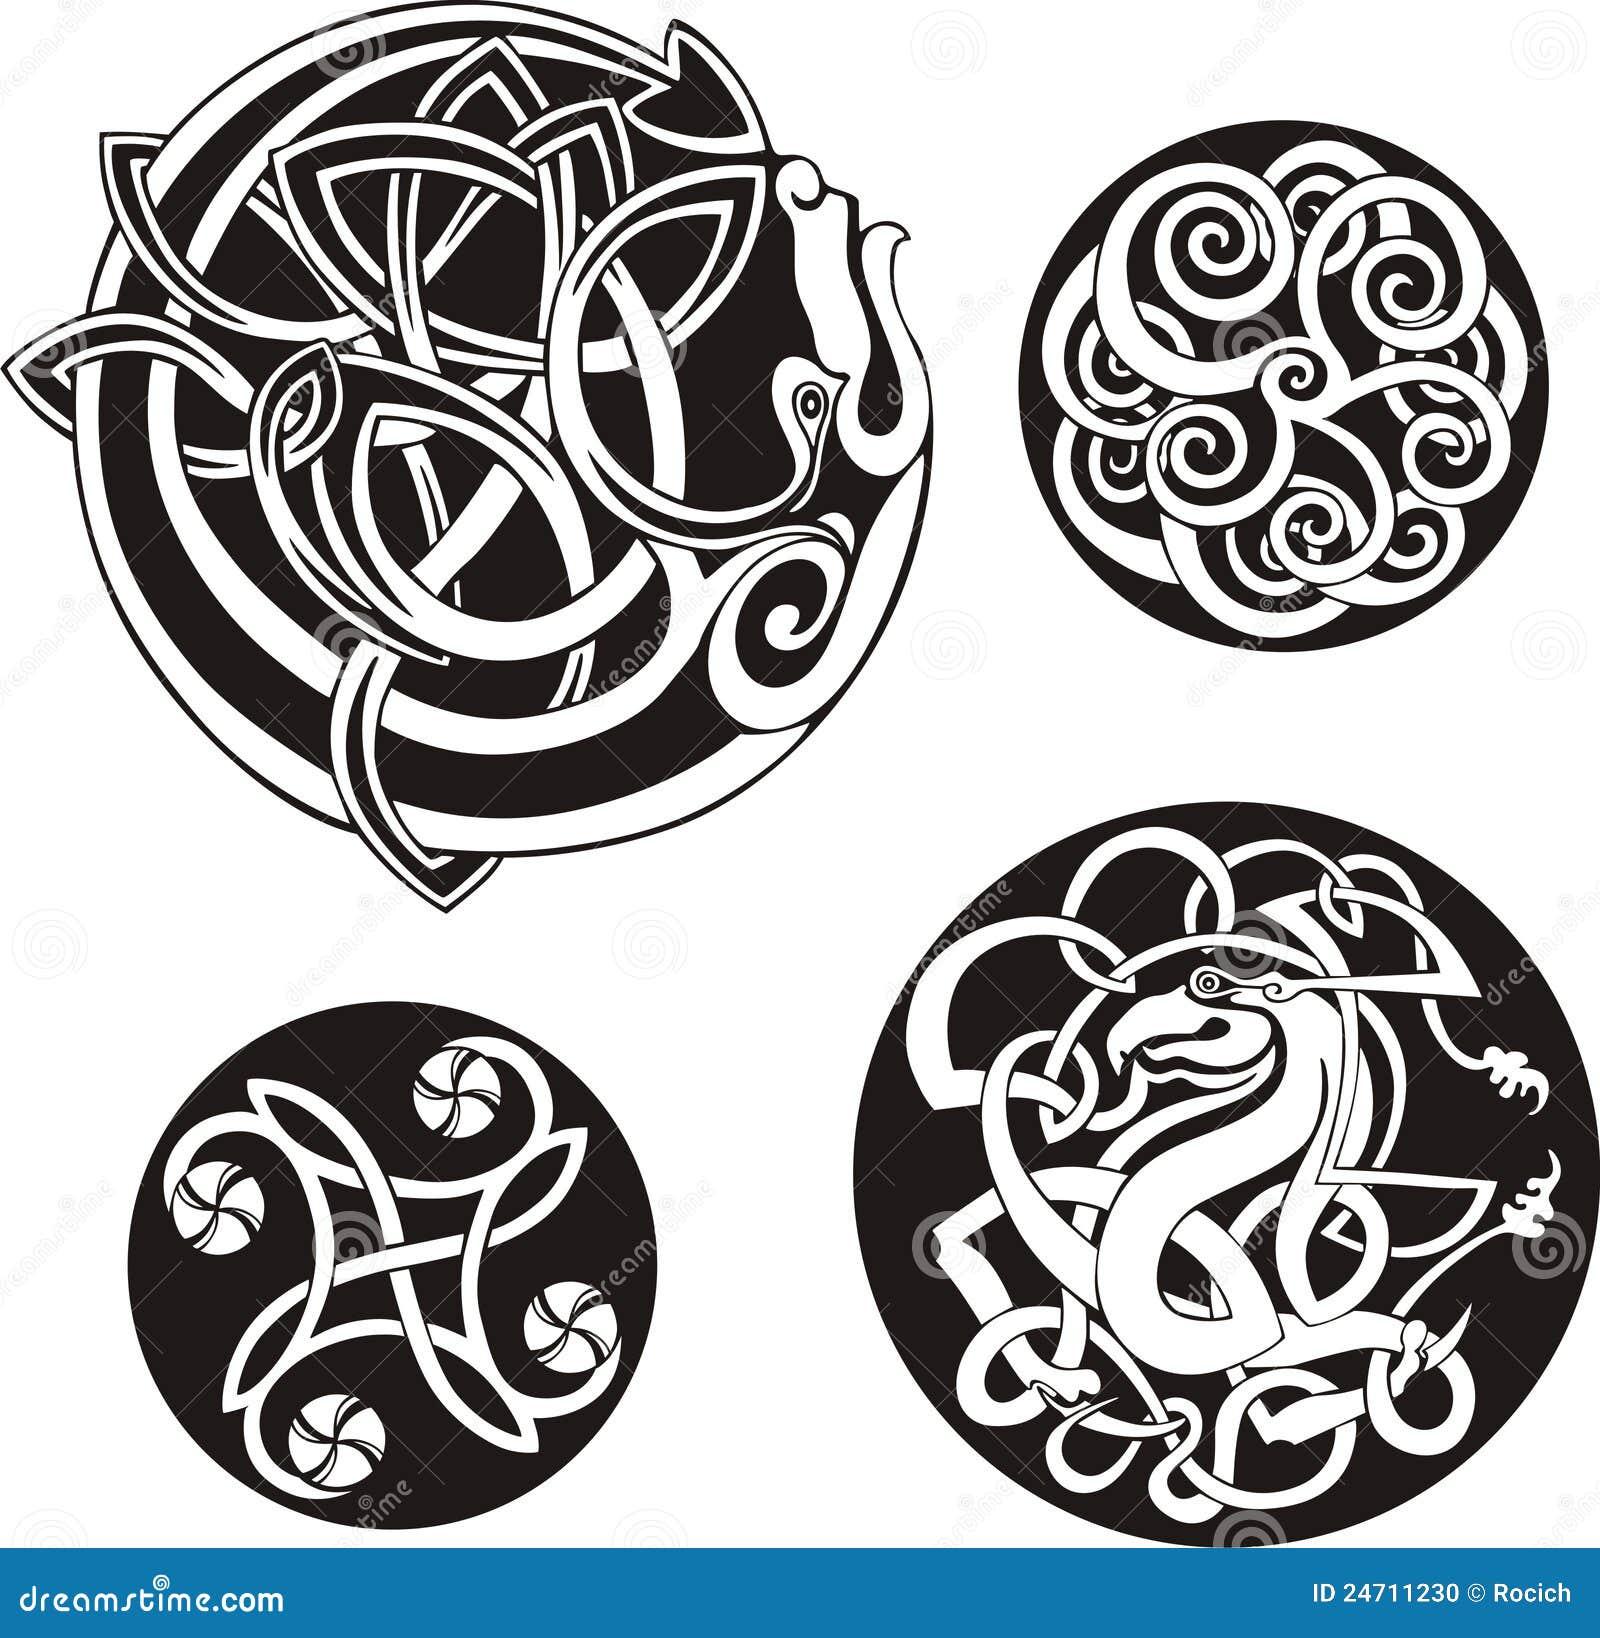 round celtic knots stock photo image 24711230. Black Bedroom Furniture Sets. Home Design Ideas